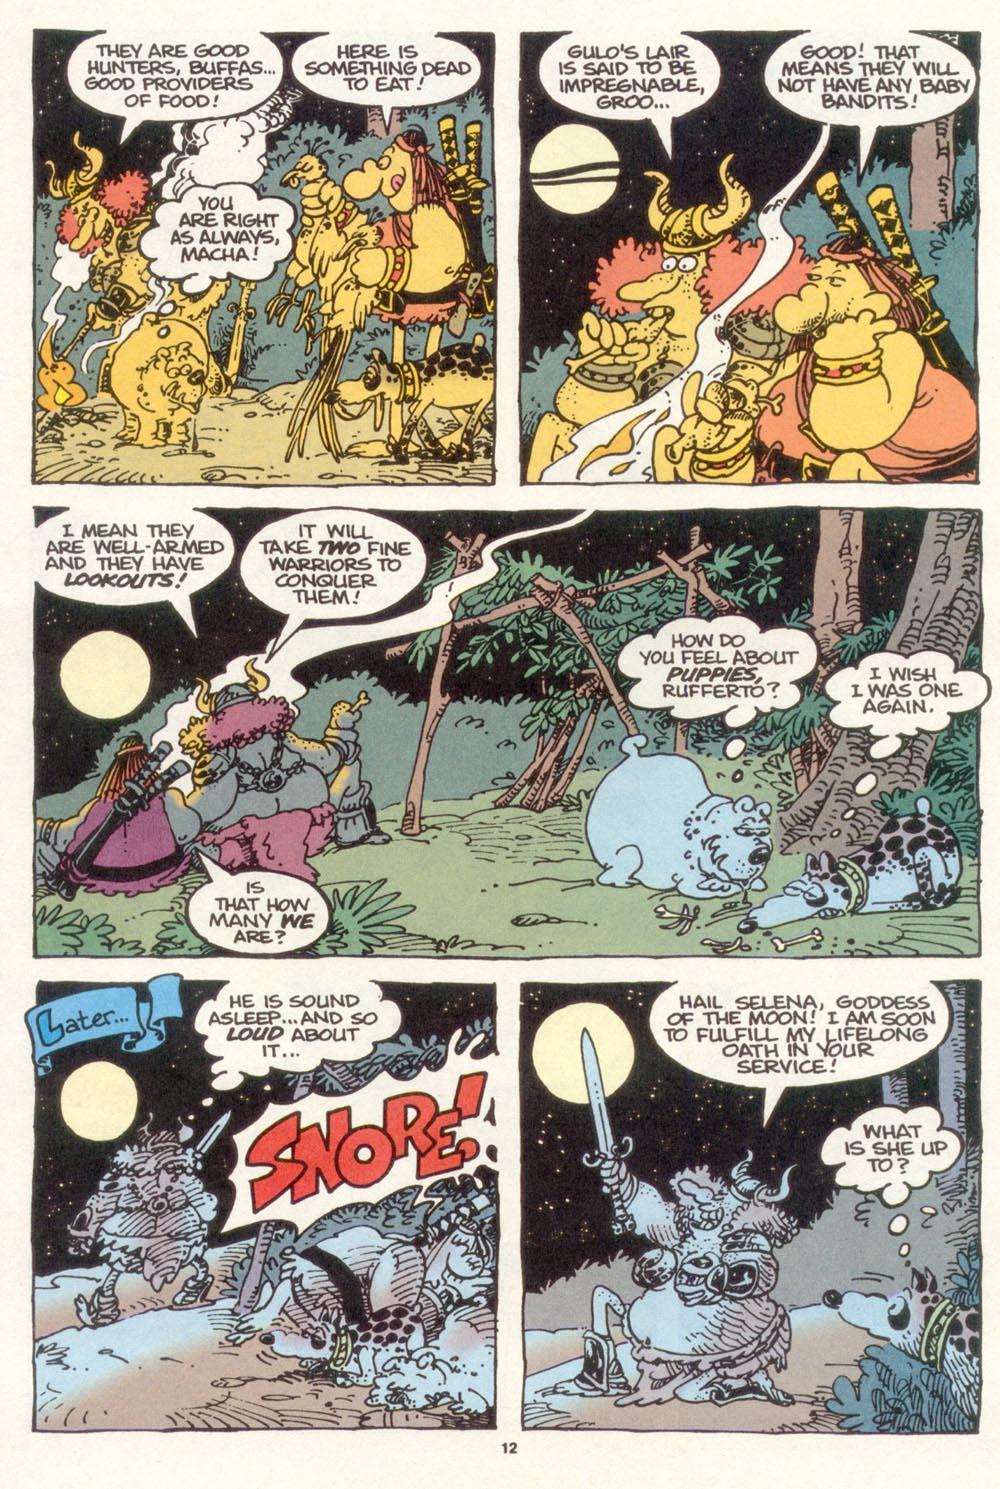 Read online Sergio Aragonés Groo the Wanderer comic -  Issue #117 - 14